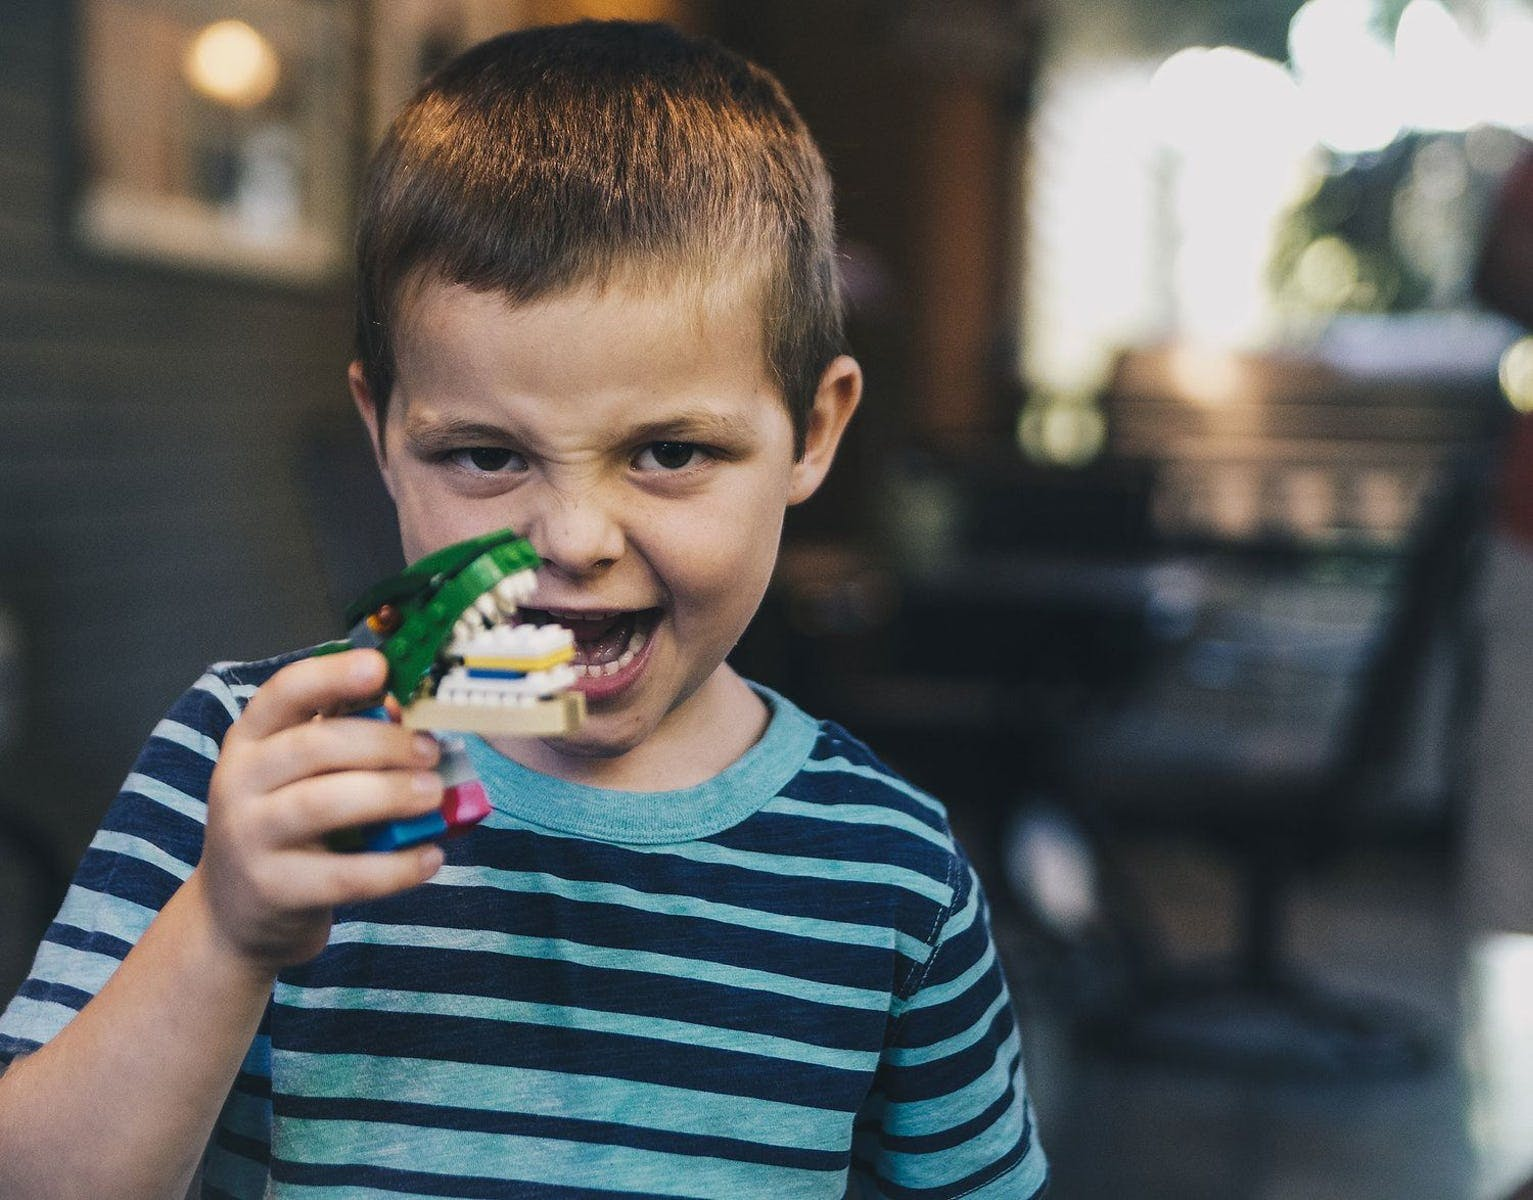 Mouth Injuries In Children